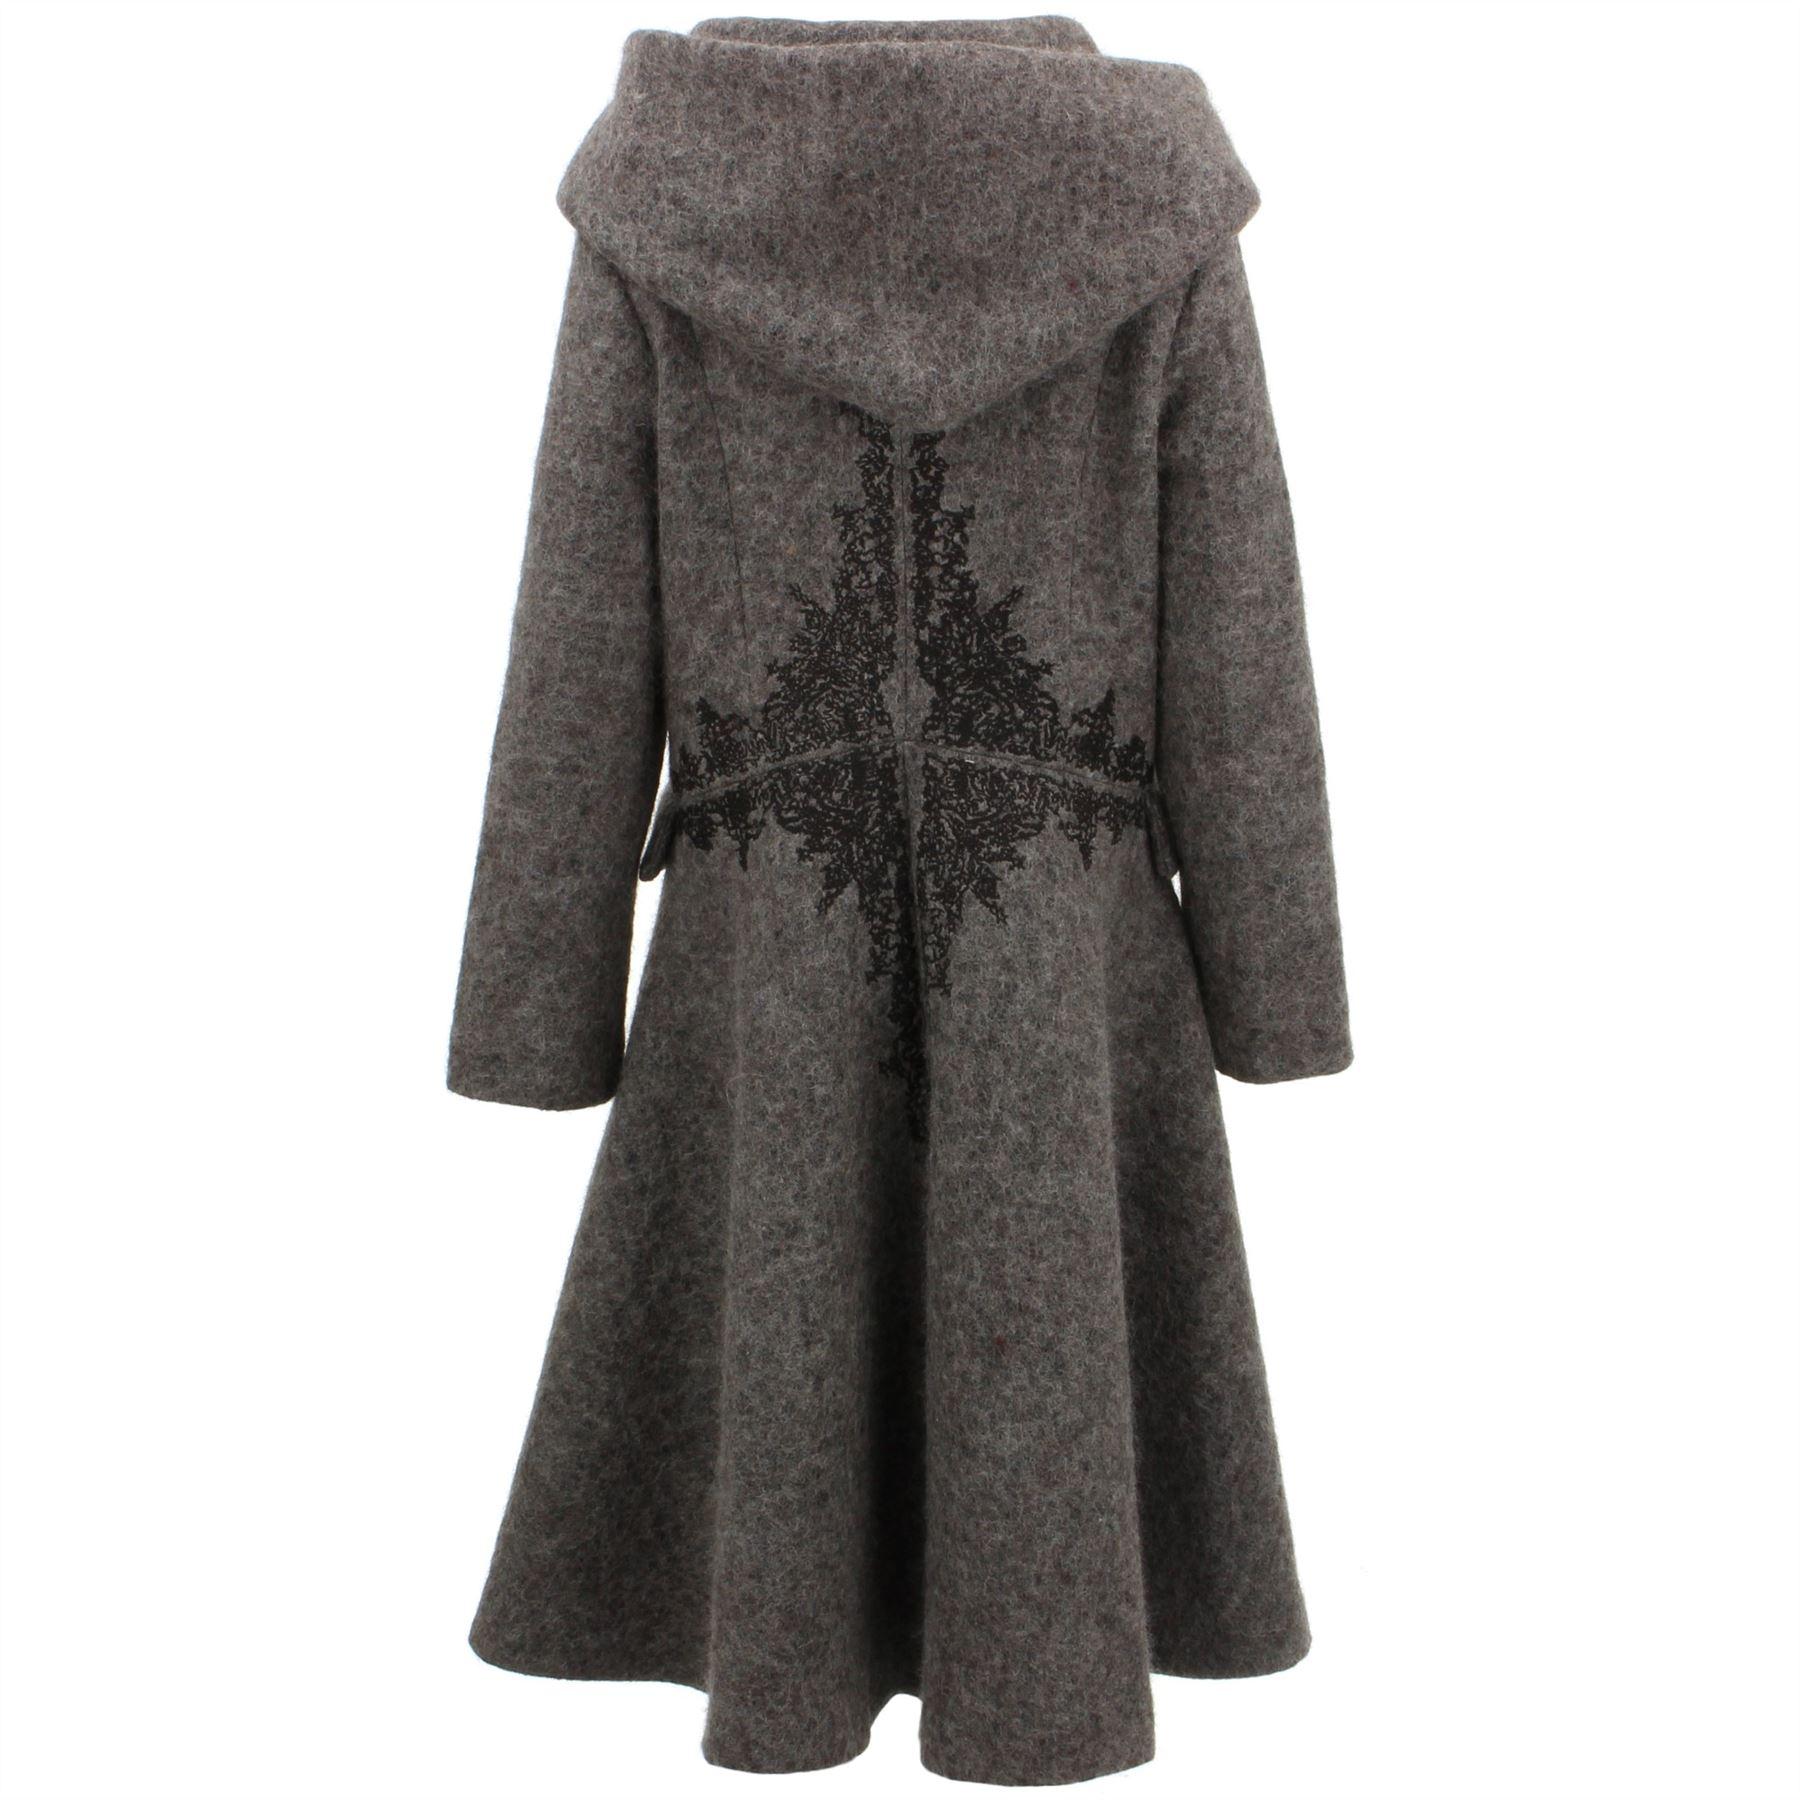 check out 3b44b 6d1e9 Details zu Ladies Wool Winter Coat Jacket BOHEMIA SWEDEN Woven Wool-rich  blend Hood